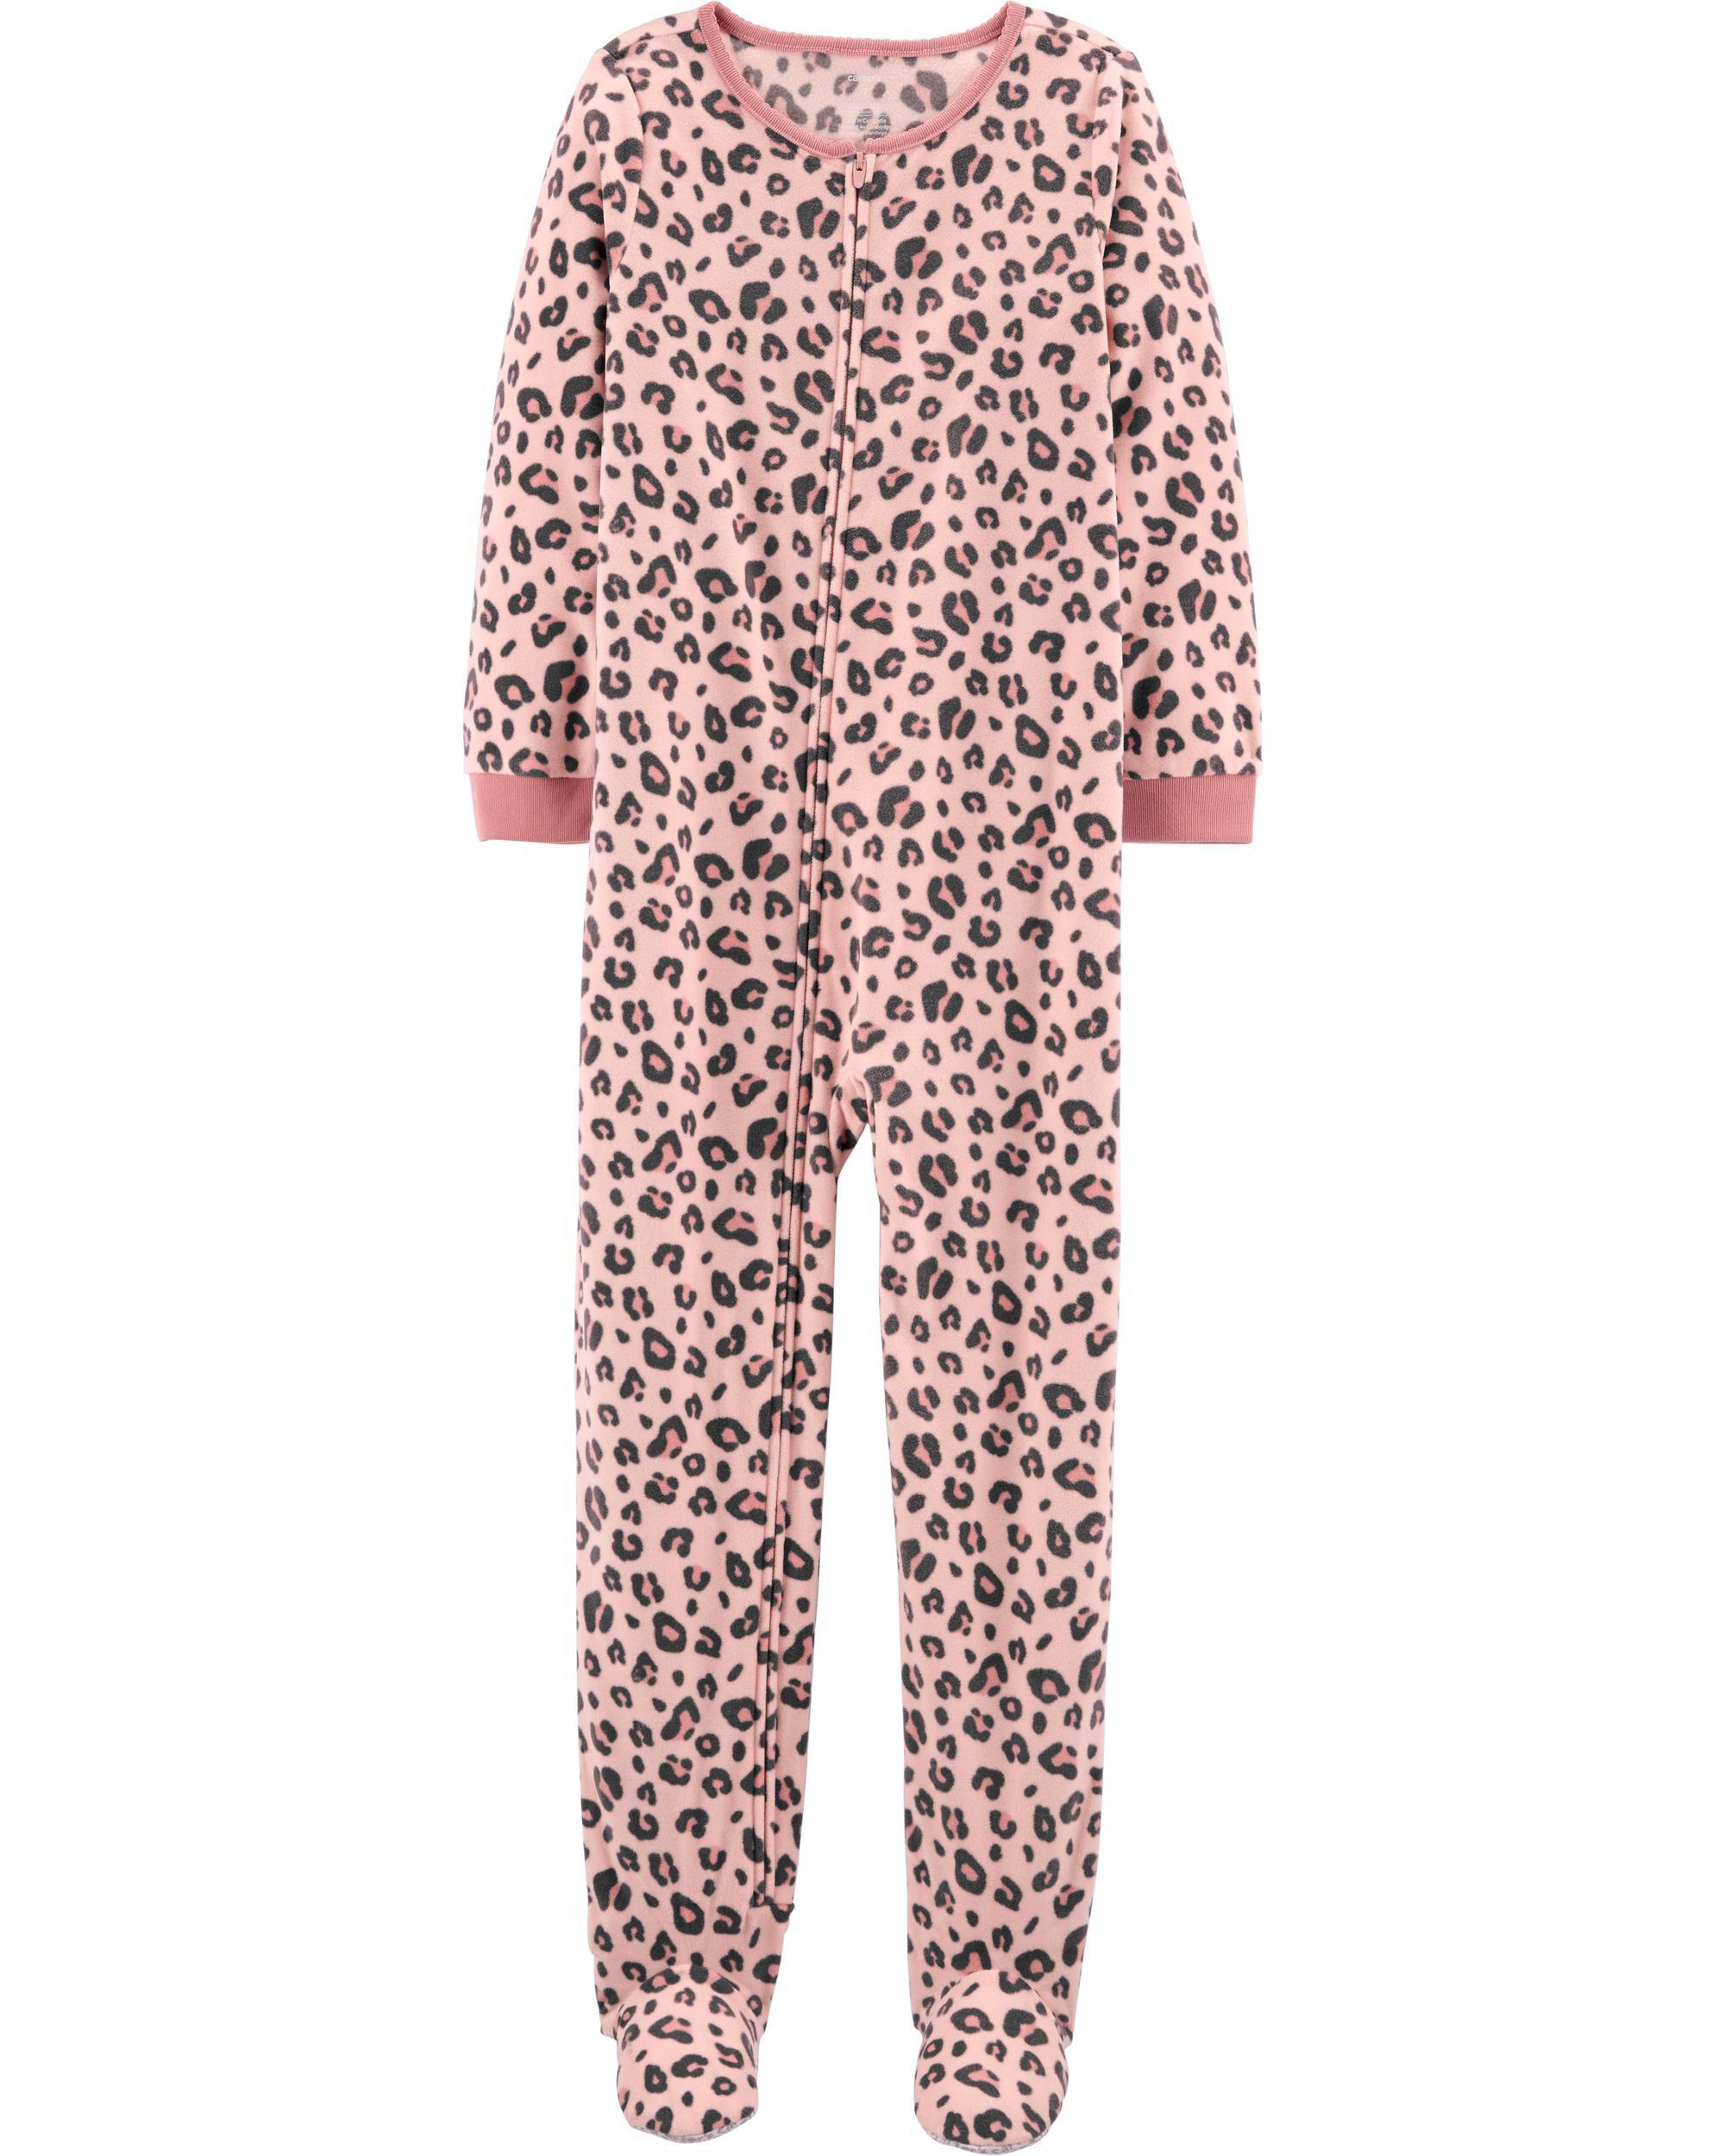 1-Piece Leopard Print Fleece Footie PJs